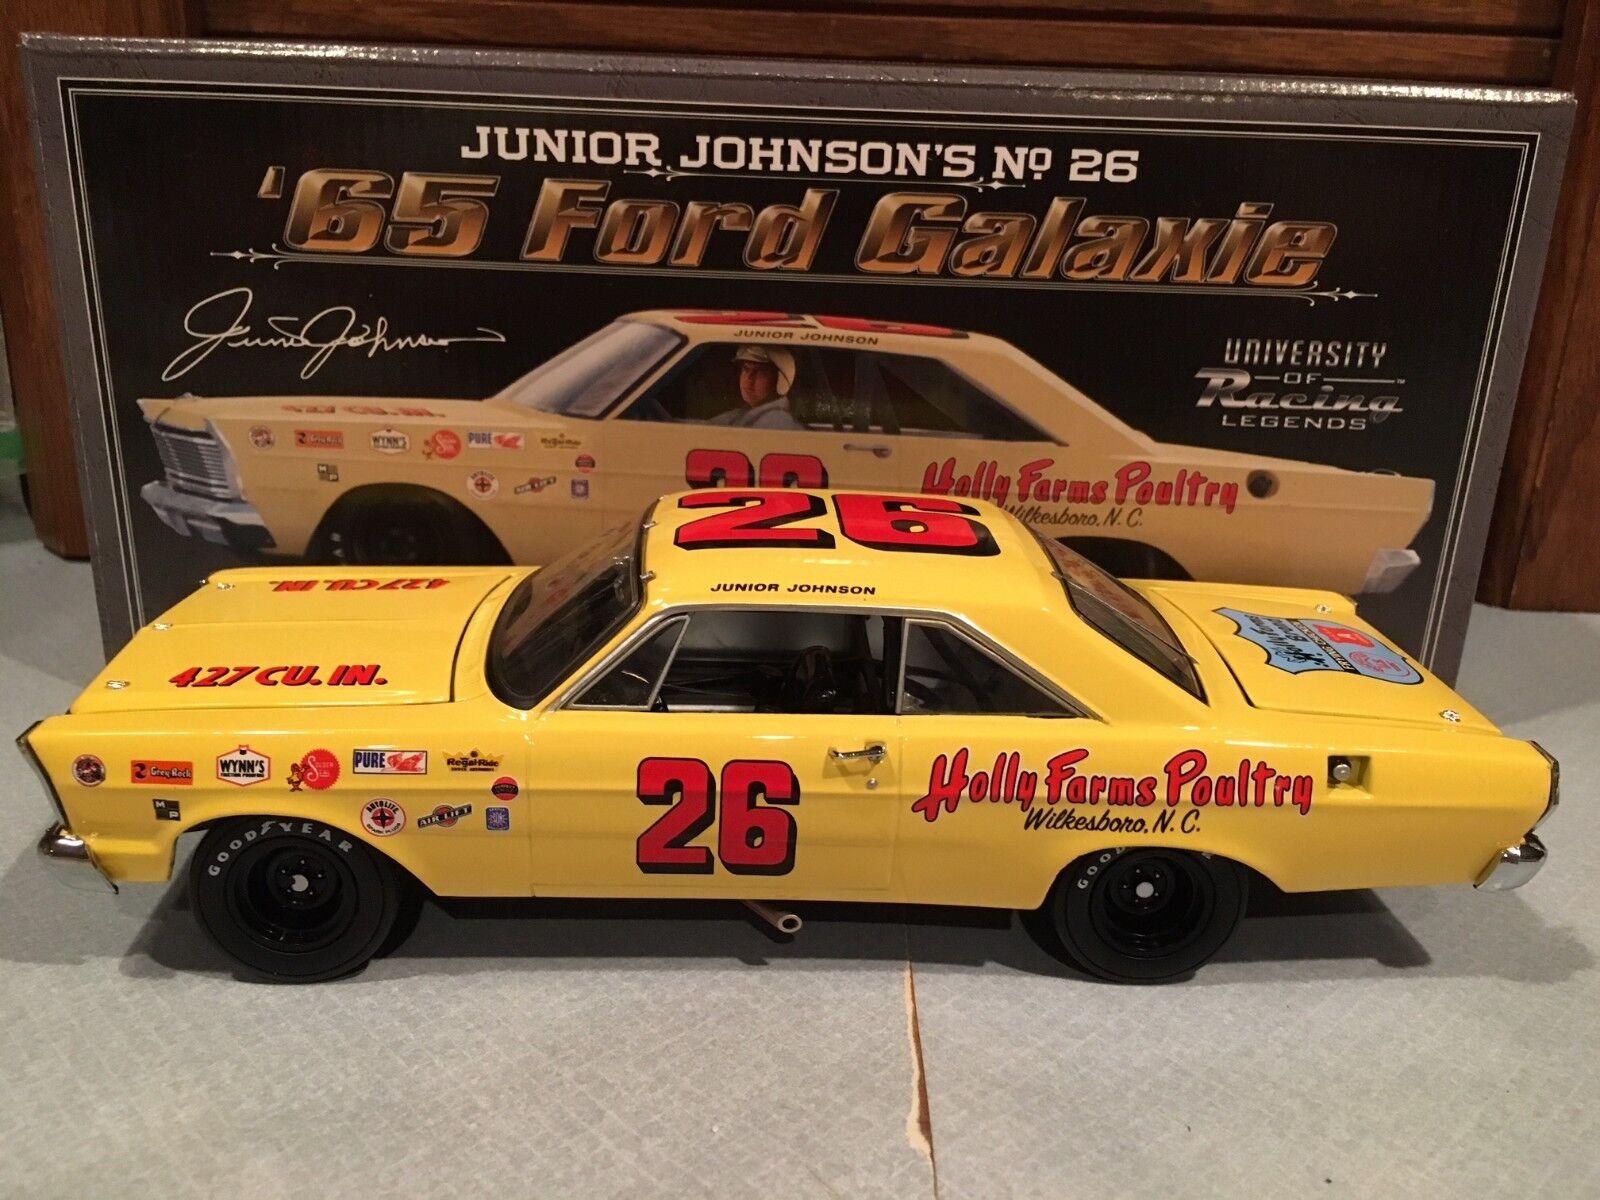 University of Racing 1965 Junior Johnson Holly Farms Ford Galaxie 1 24